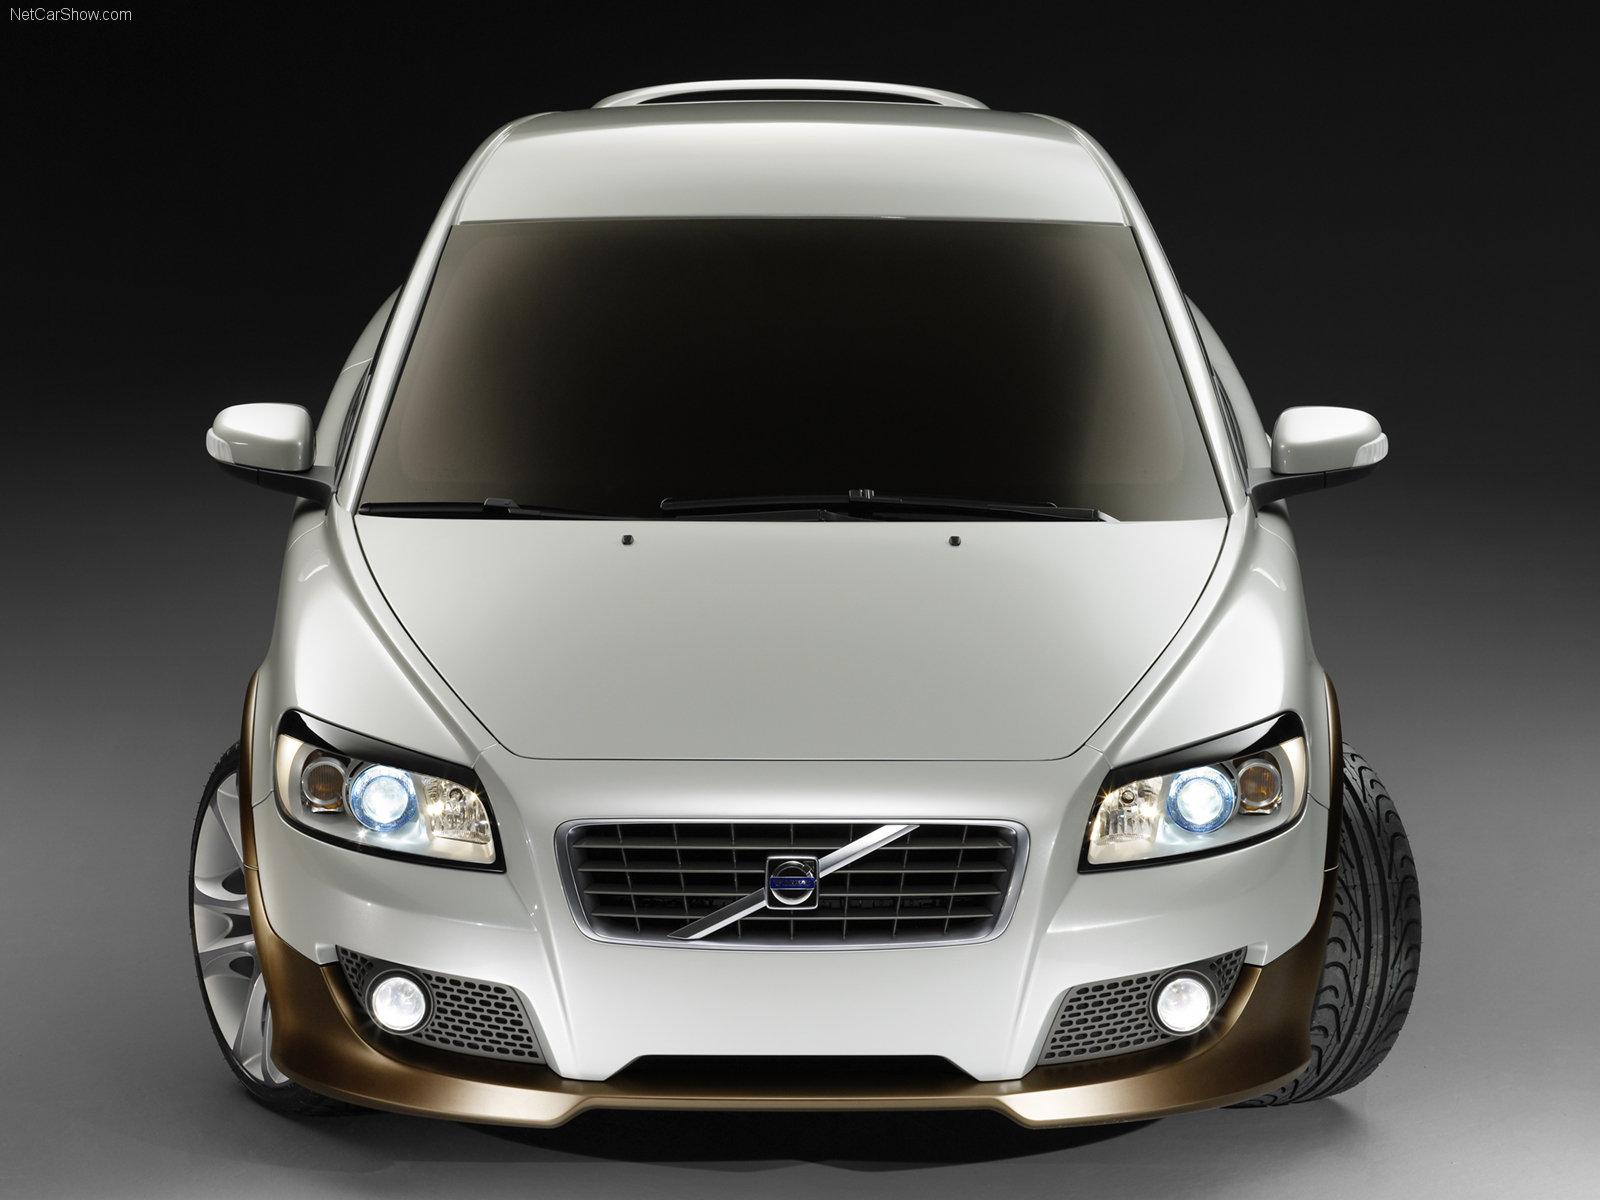 Volvo 30 C30 Design Concept 2005 Volvo-C30_Design_Concept-2005-1600-05